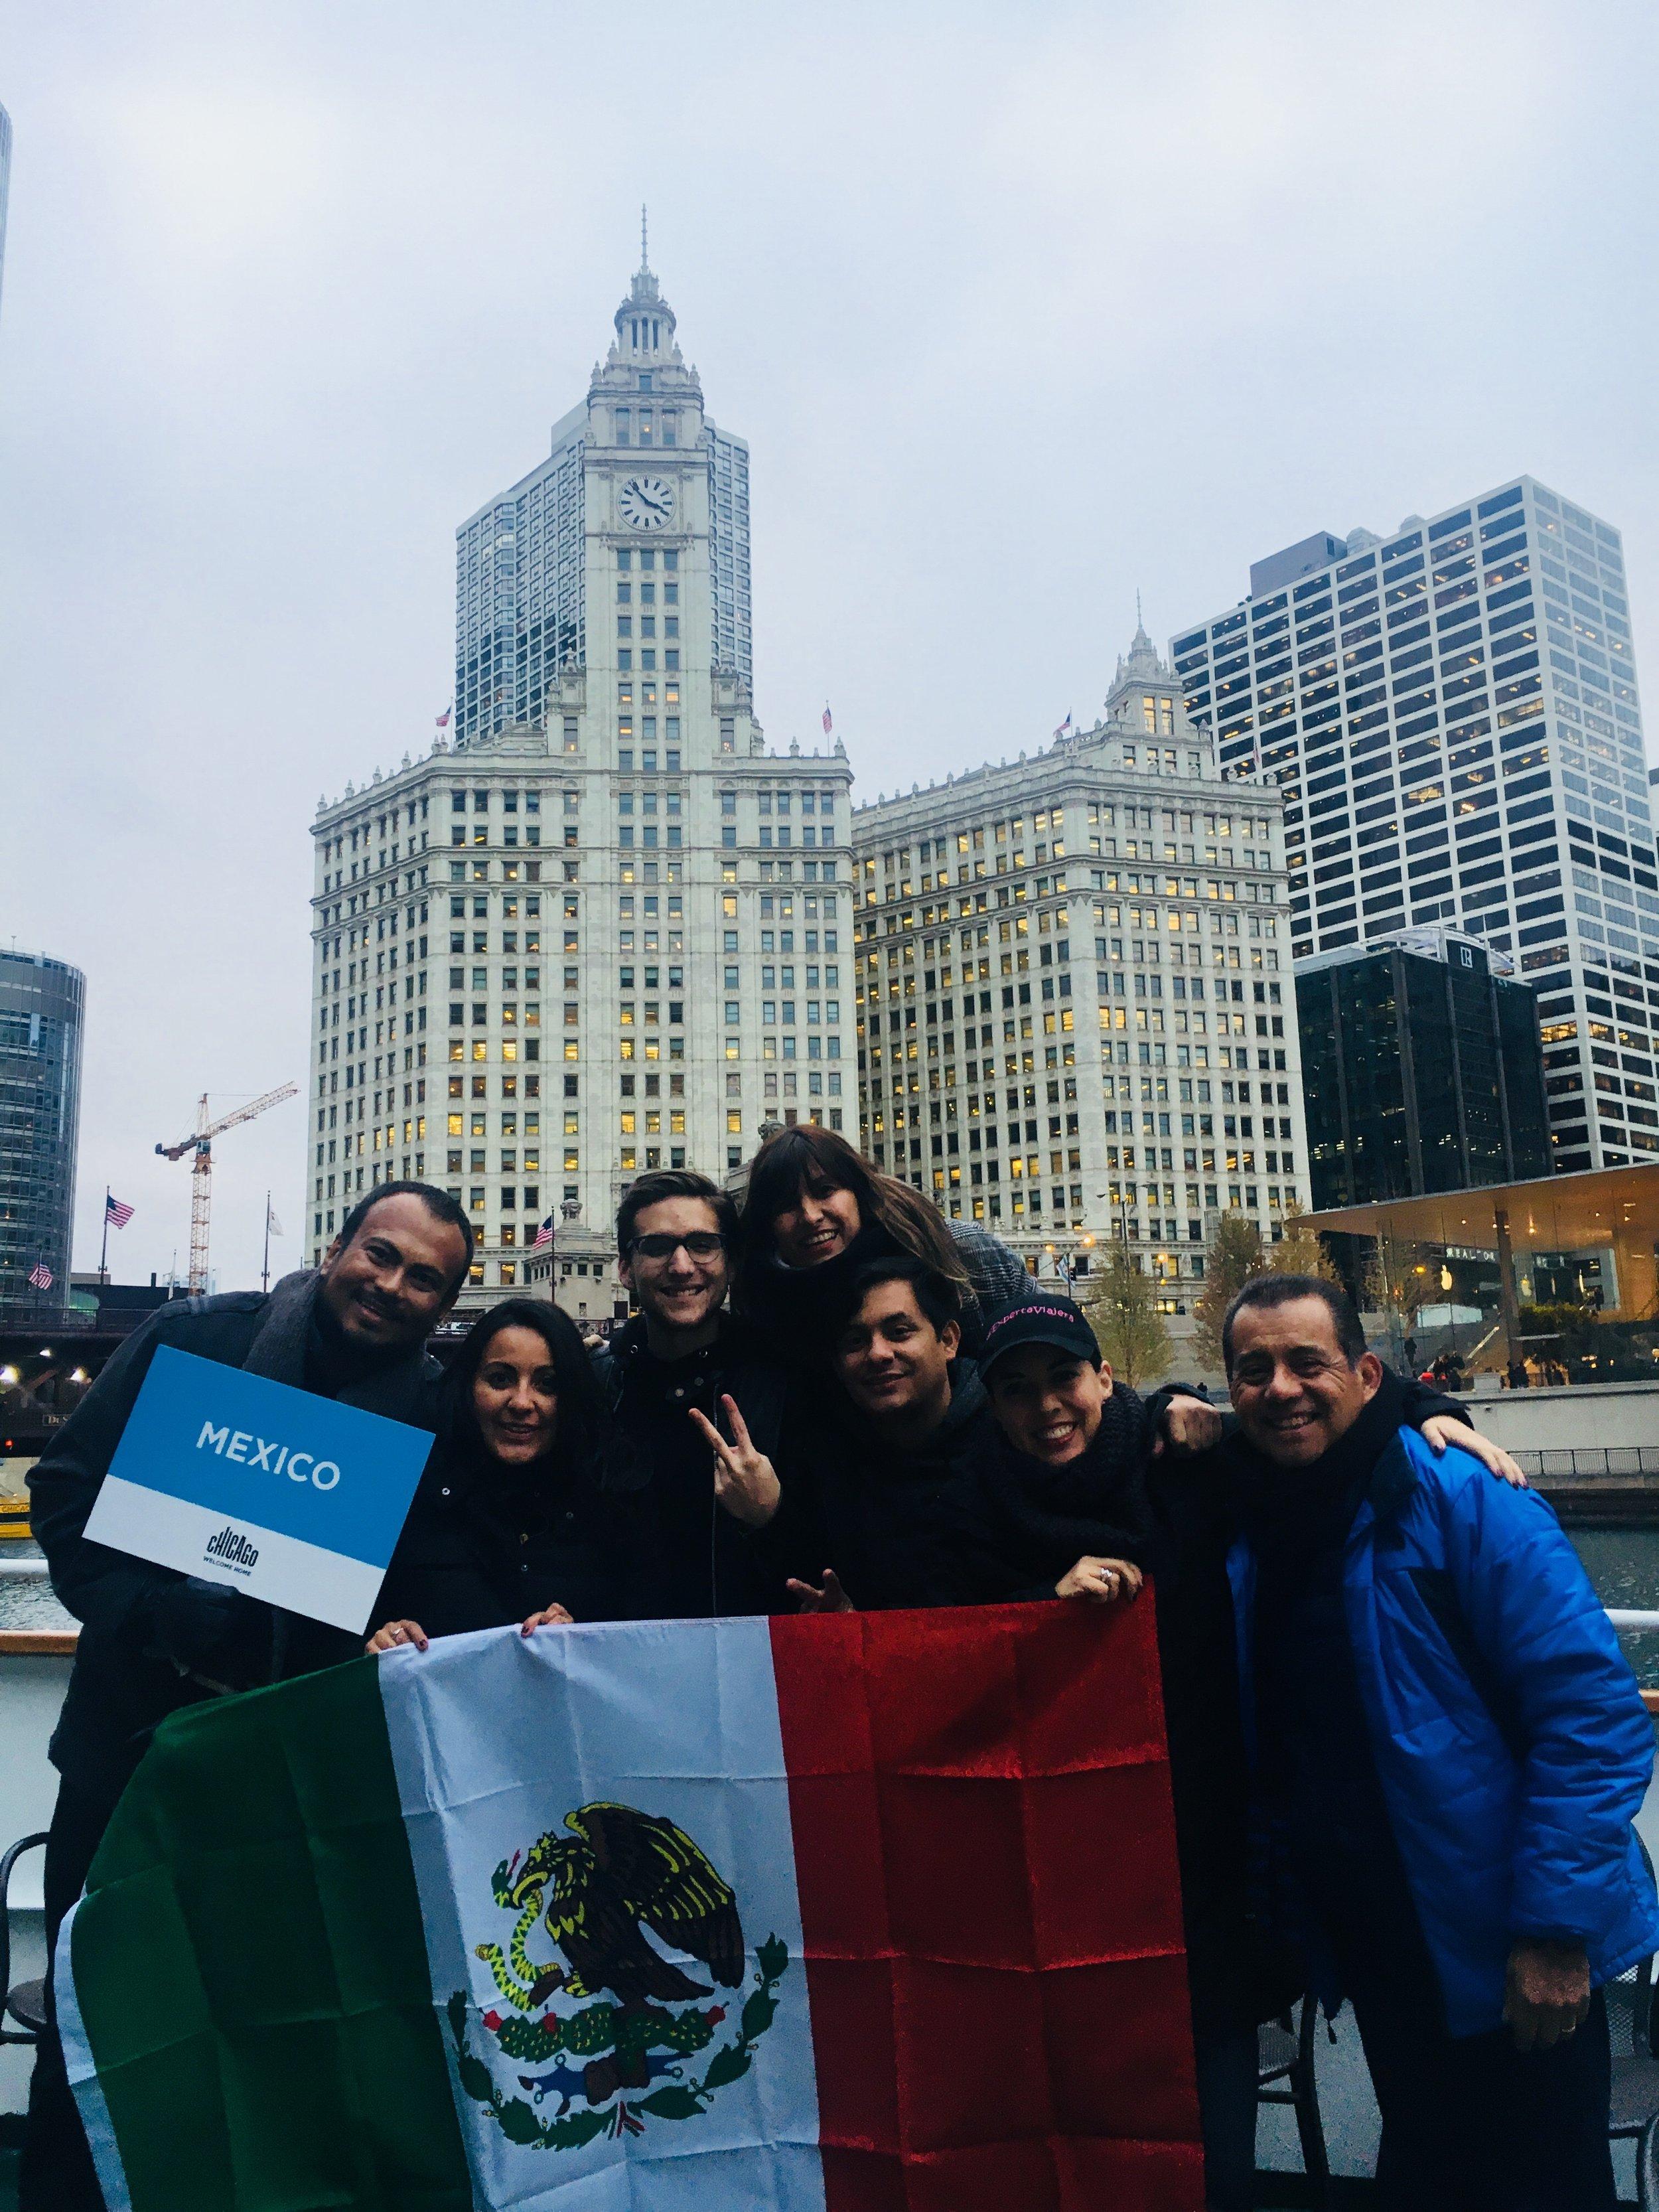 El equipo de influencers de México en Chicago para el Global Influencers Fam de #ChicagoHome